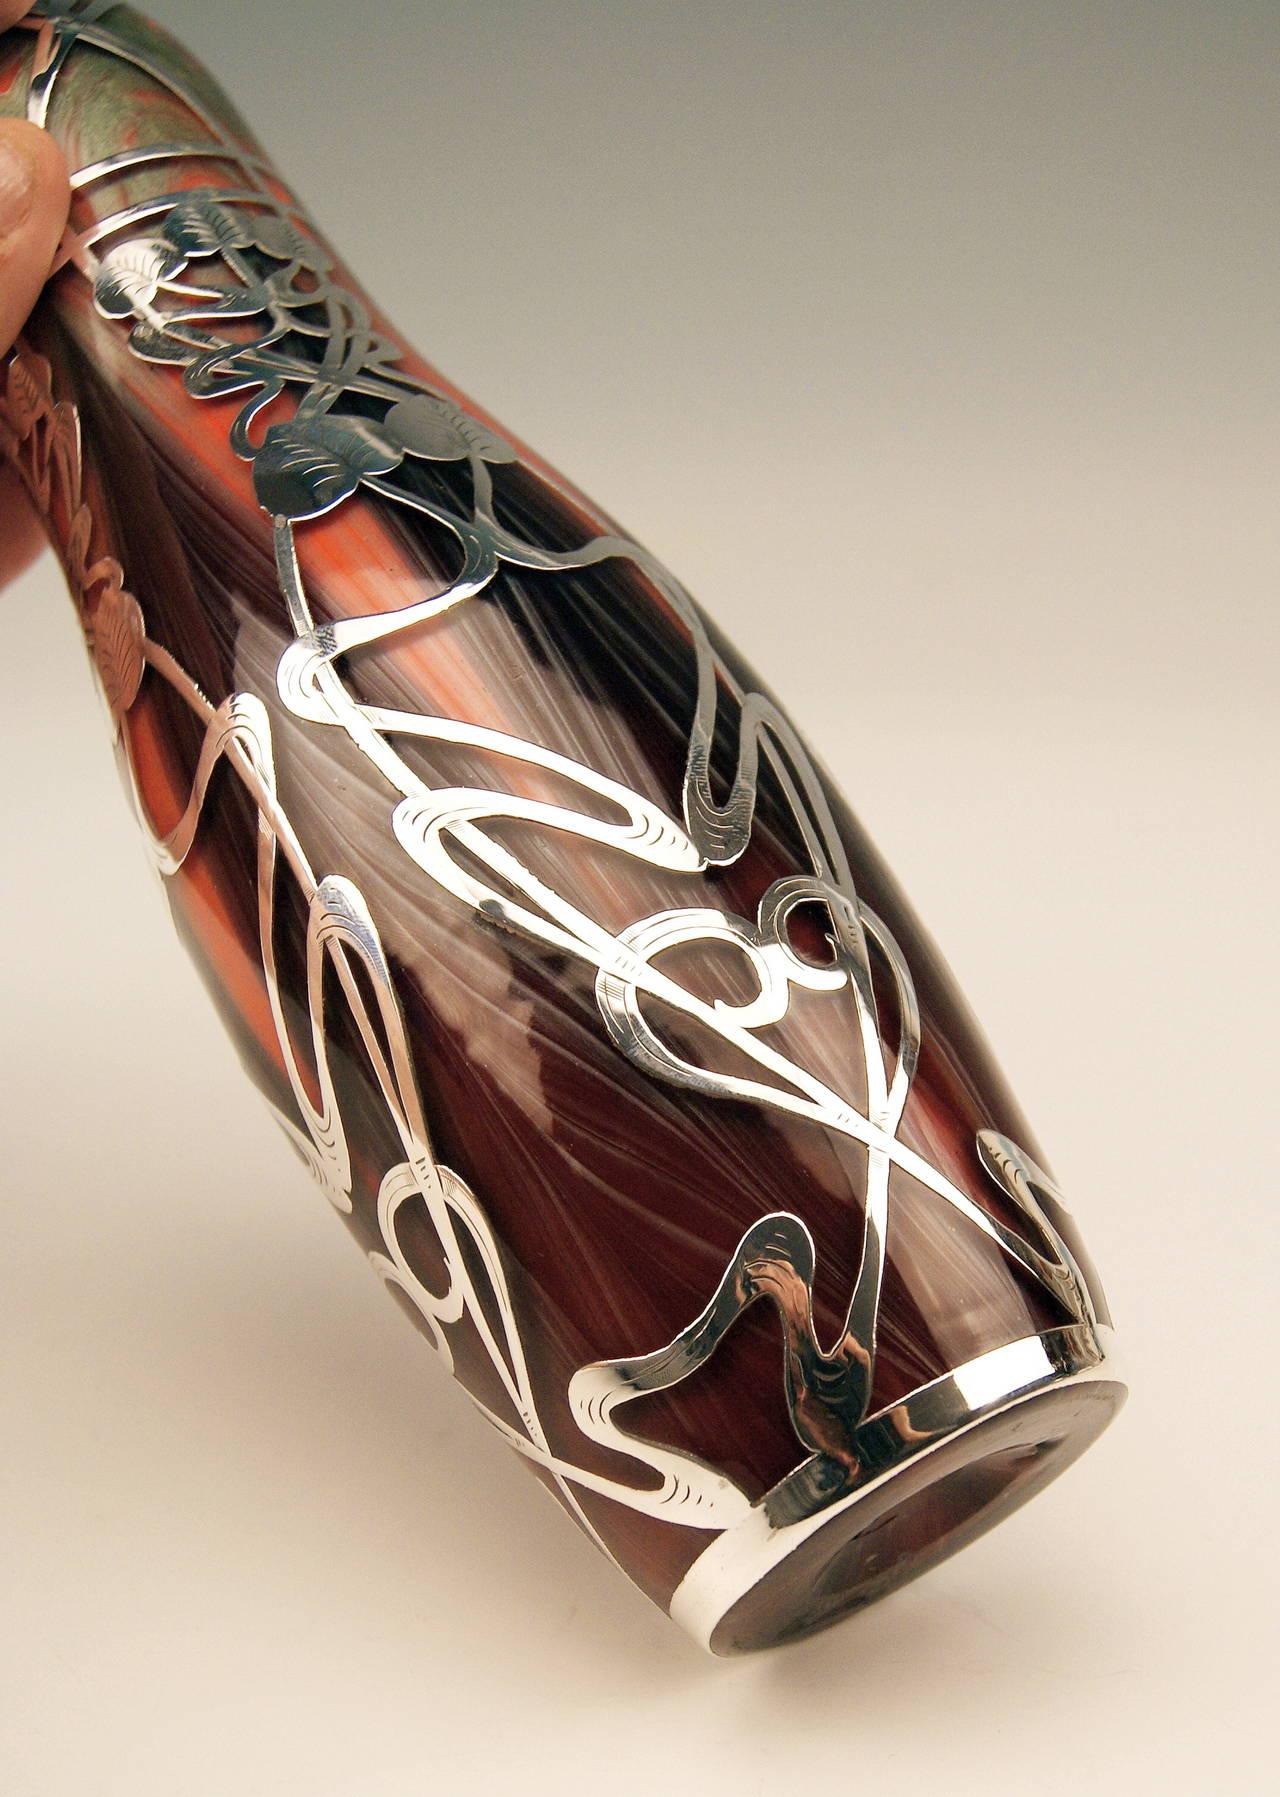 Vase Loetz Widow Art Nouveau, Titania Gre 2512 Silver Overlay, circa 1906 For Sale 1